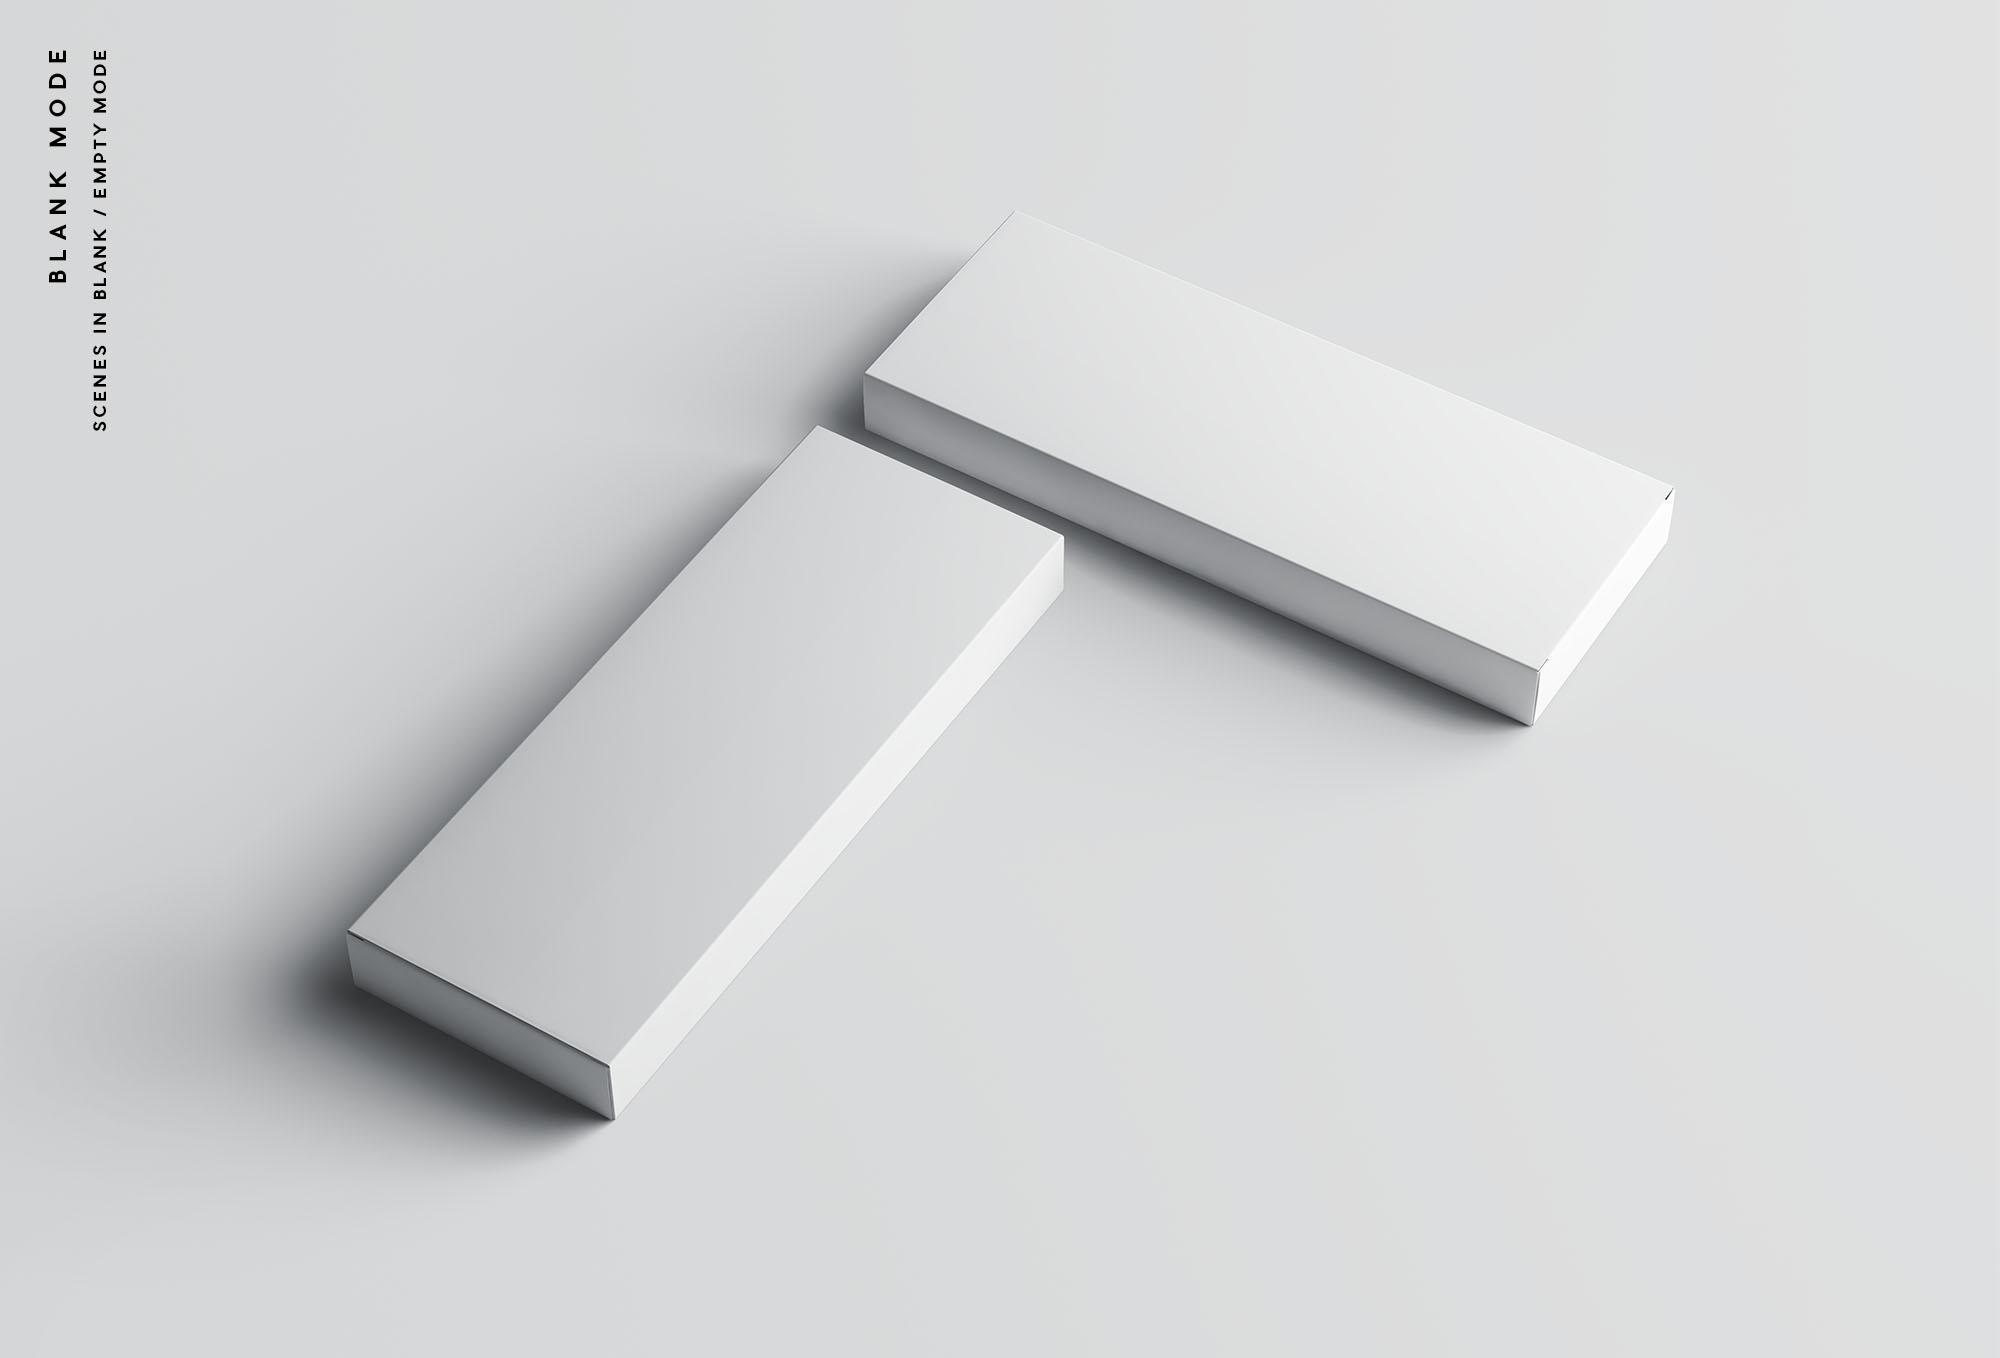 Rectangular Box Mockup - Blank Mode